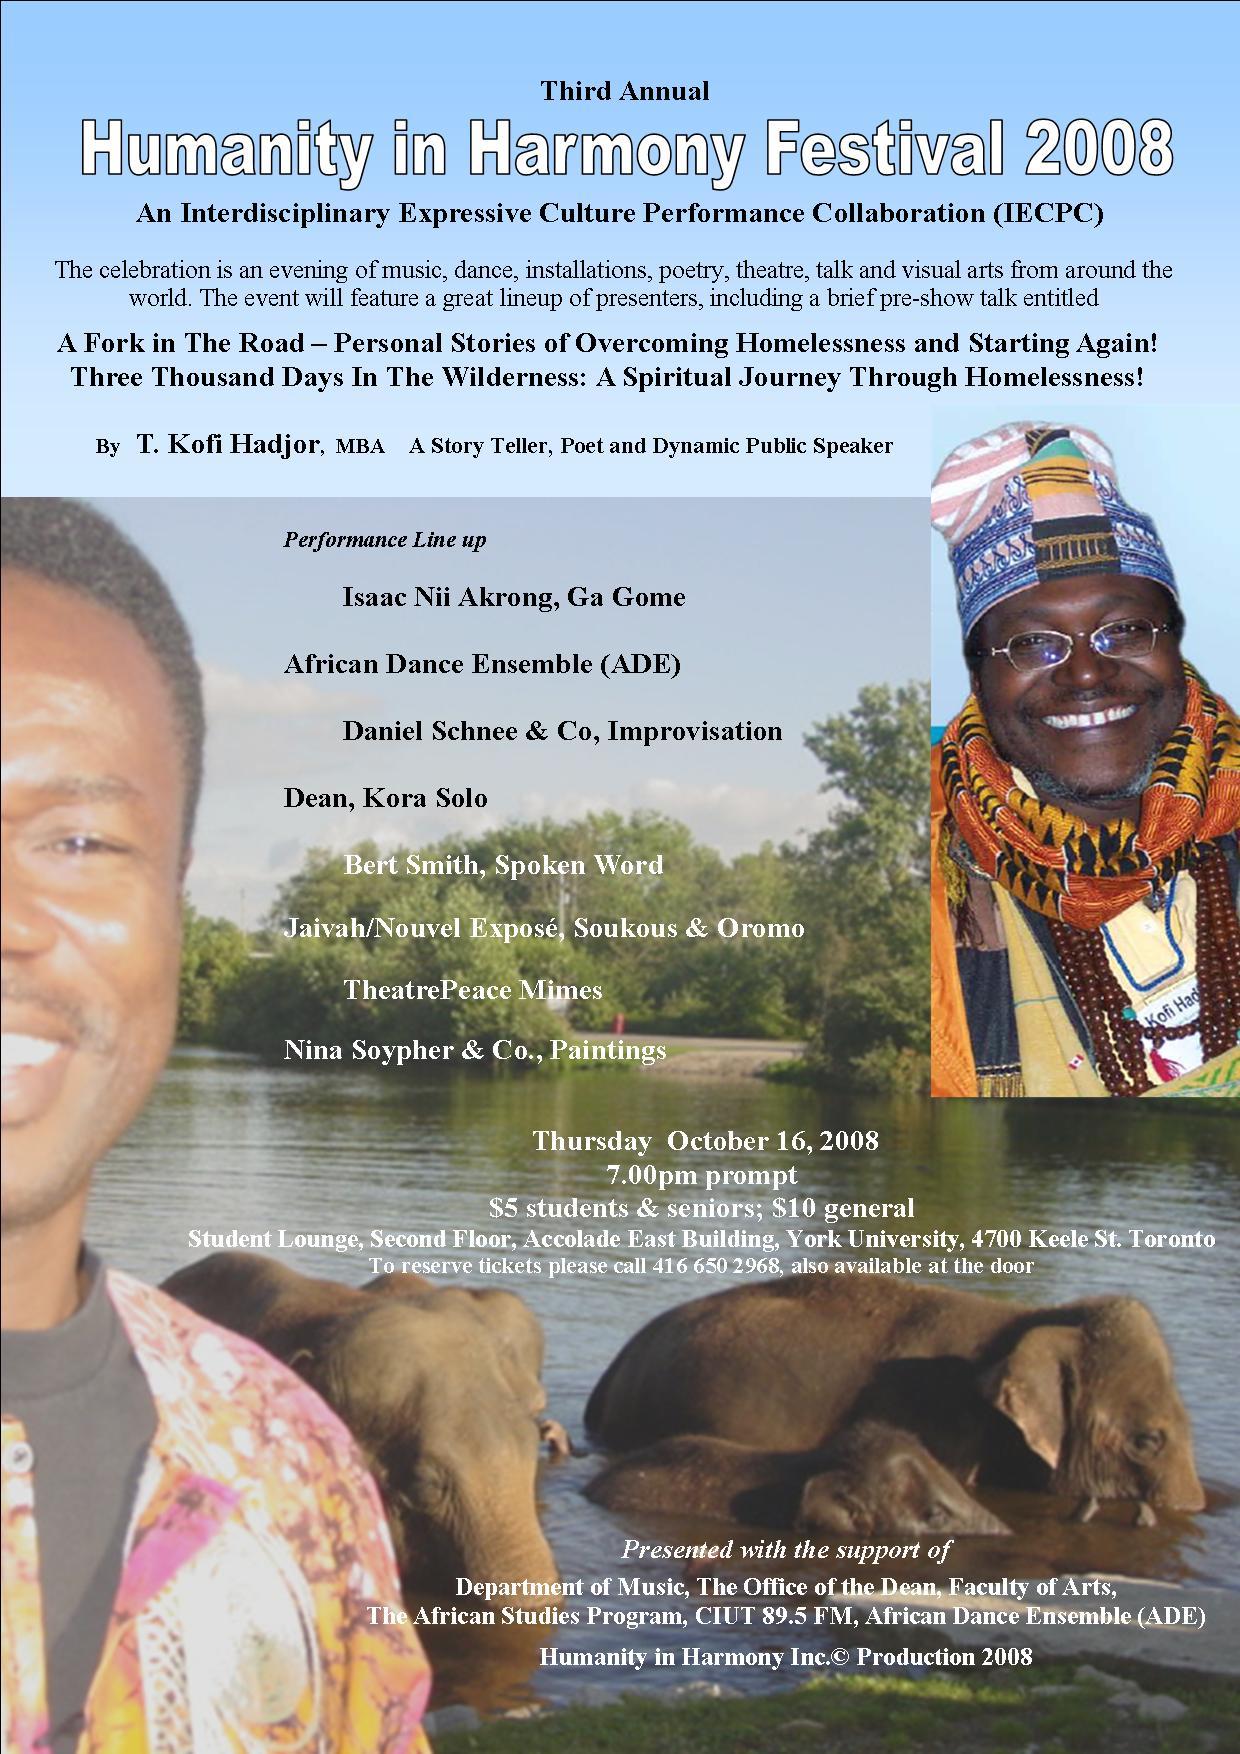 ADE - African Dance Ensemble